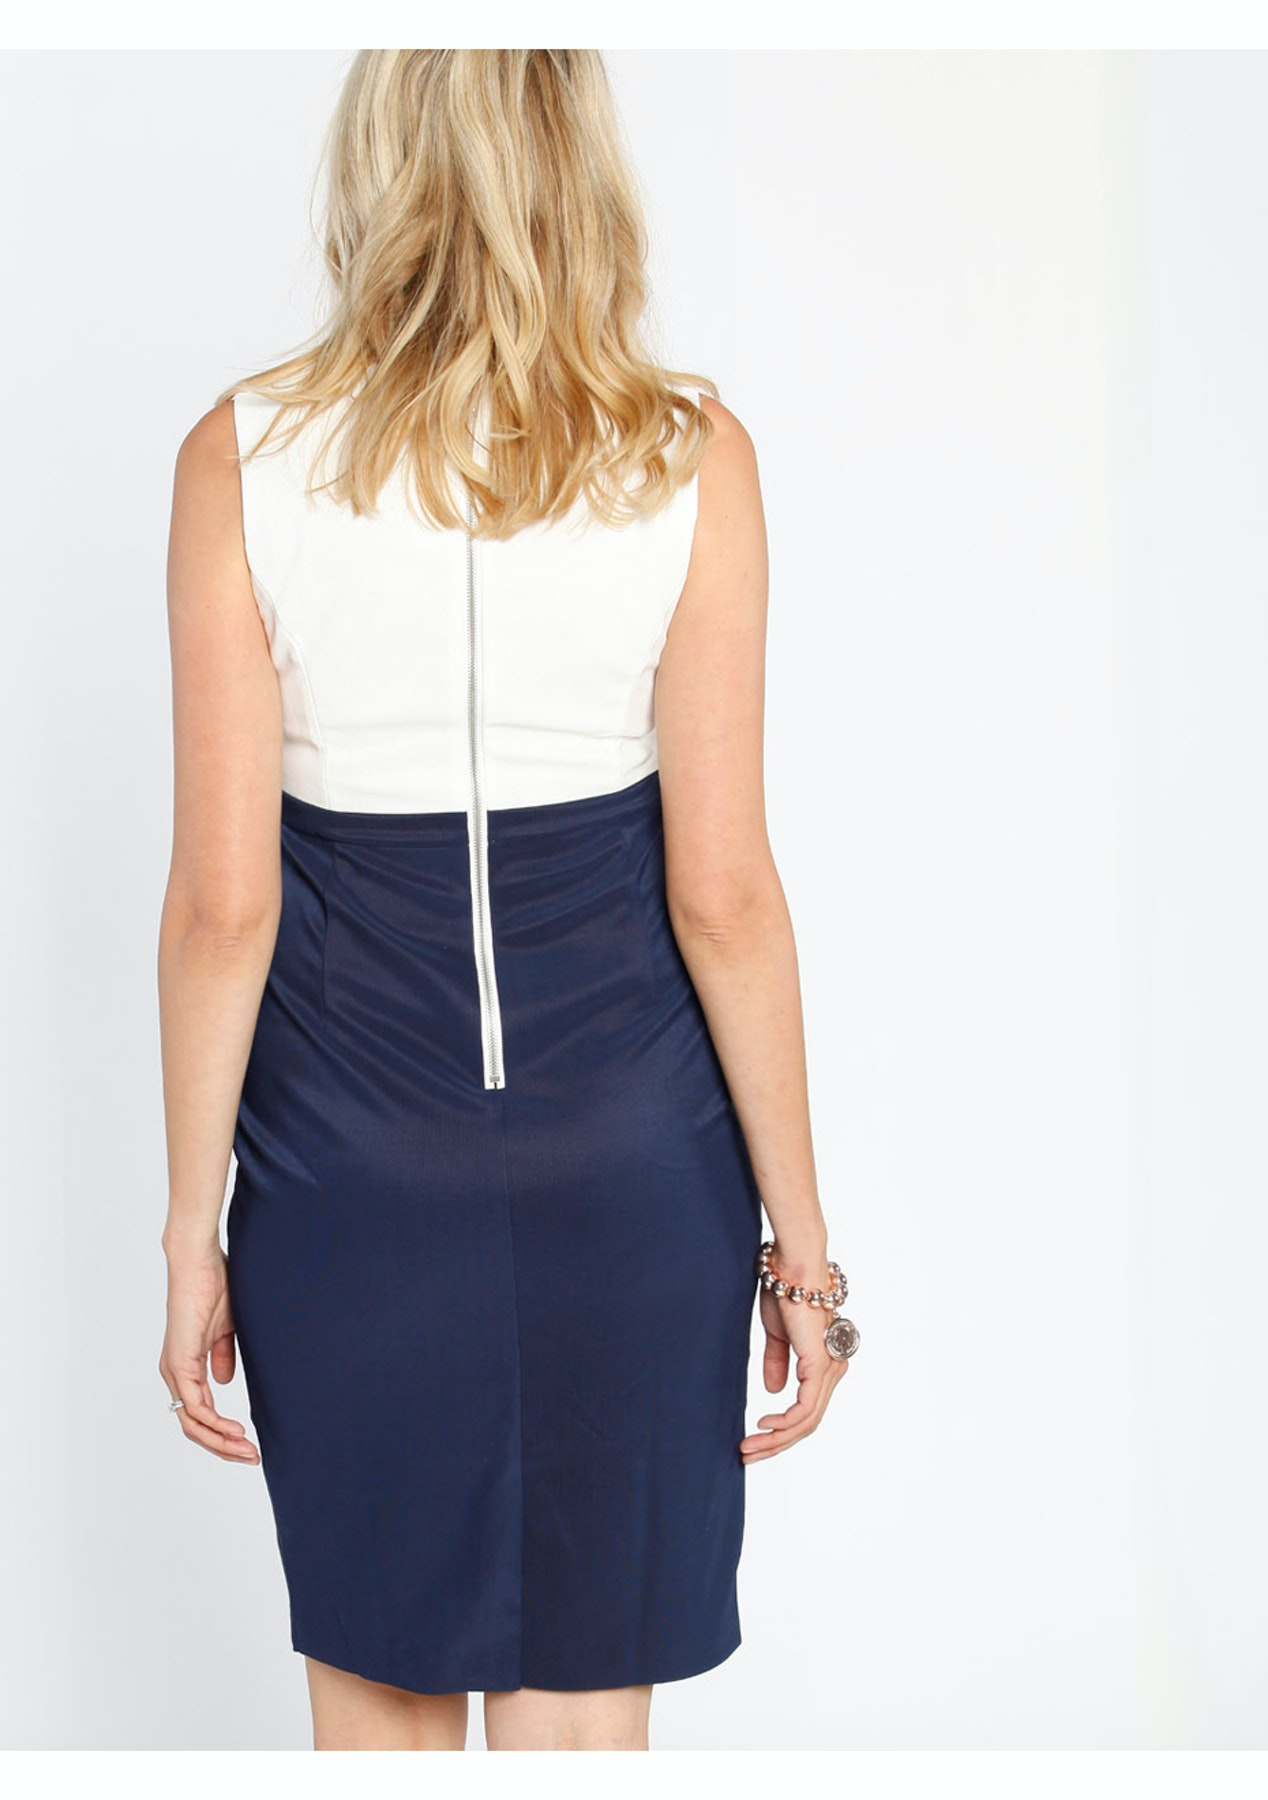 e499c75e9cd691 Angel Maternity - Sleeveless Ponti Nursing Dress - White   Navy Block -  Love Your Bump - On Trend Maternity Wear - Onceit